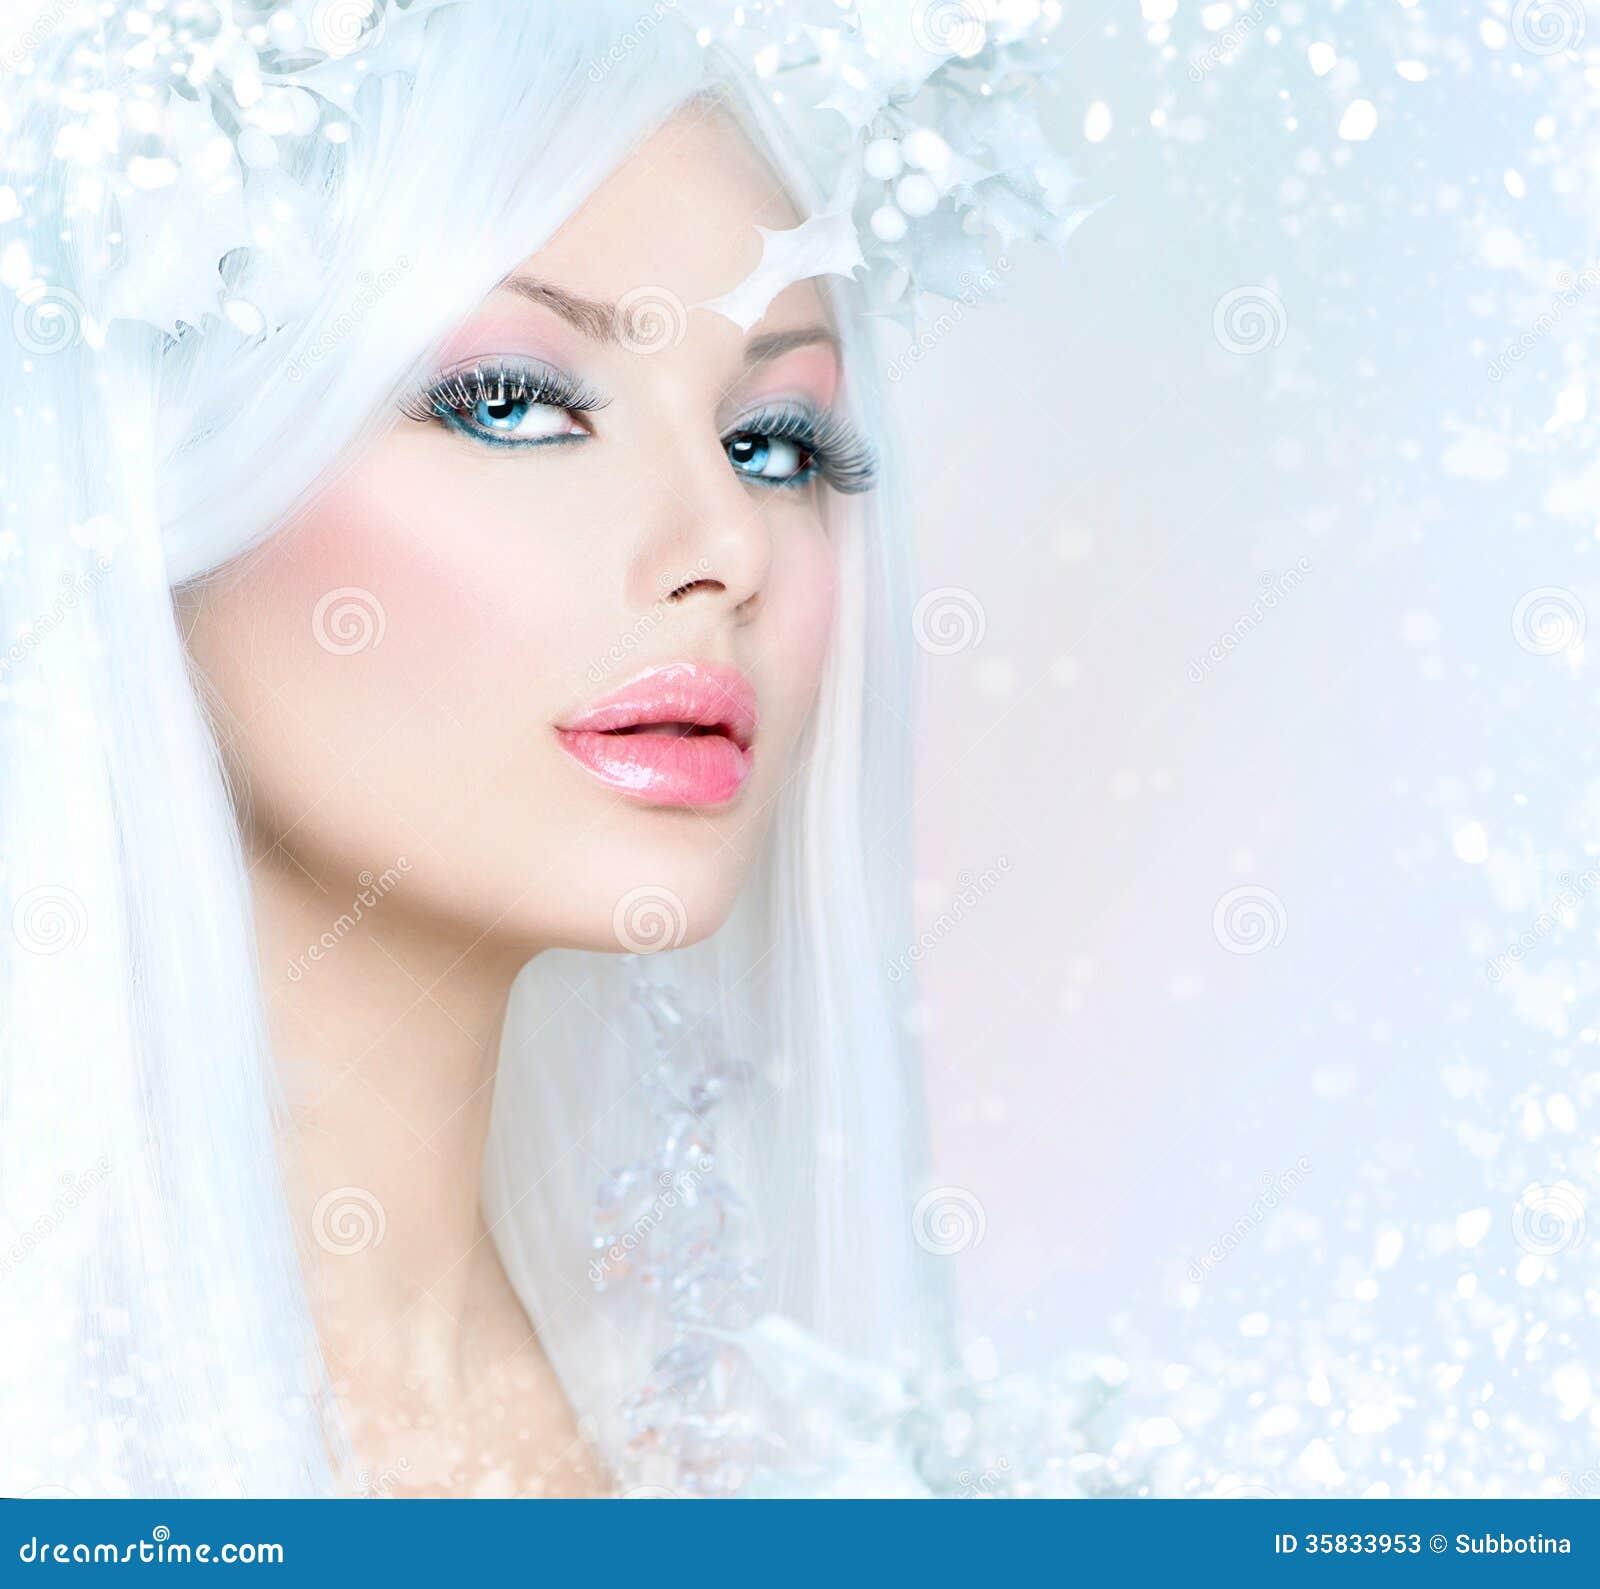 Fashion Beauty Model Girl Stock Image Image Of Manicured: Winter Beauty Woman Stock Photos